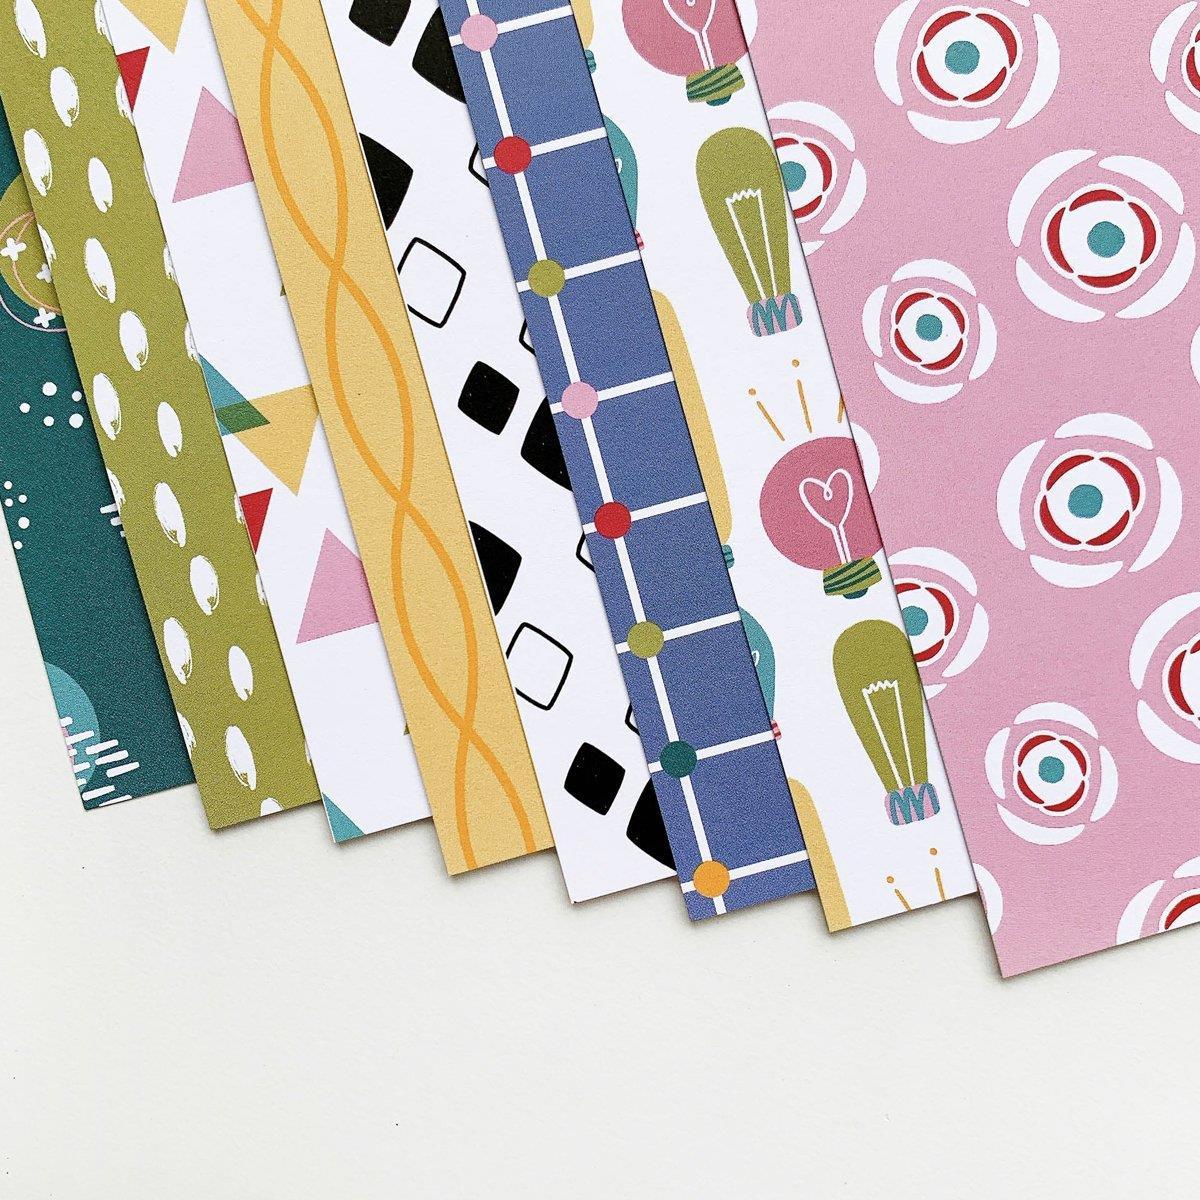 Bright Idea Slimline, Catherine Pooler Patterned Paper -